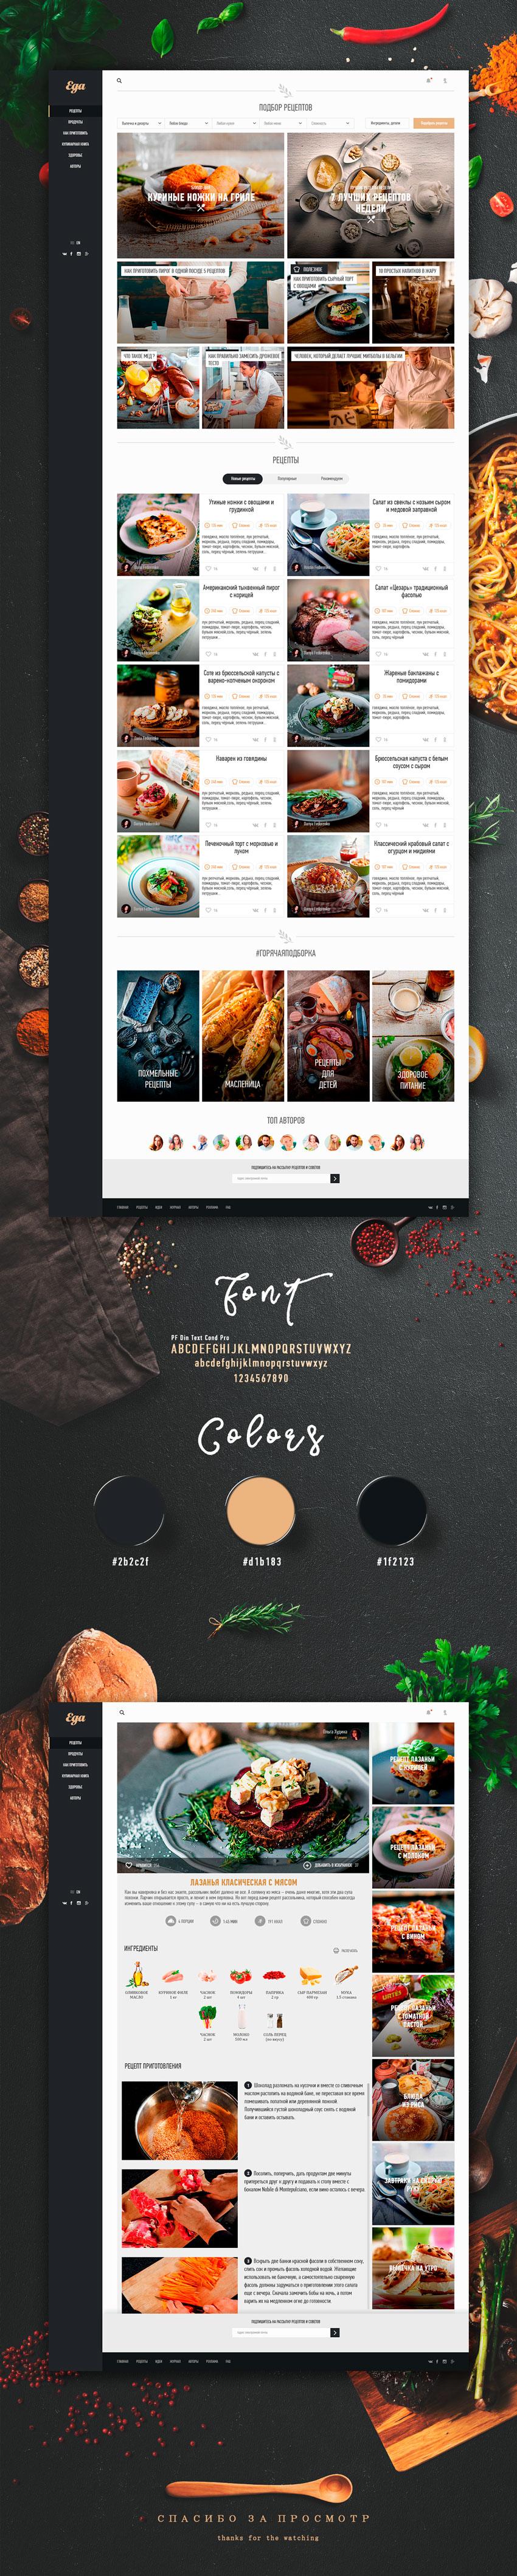 Eda - Food Website template (.Psd) скачать бесплатно